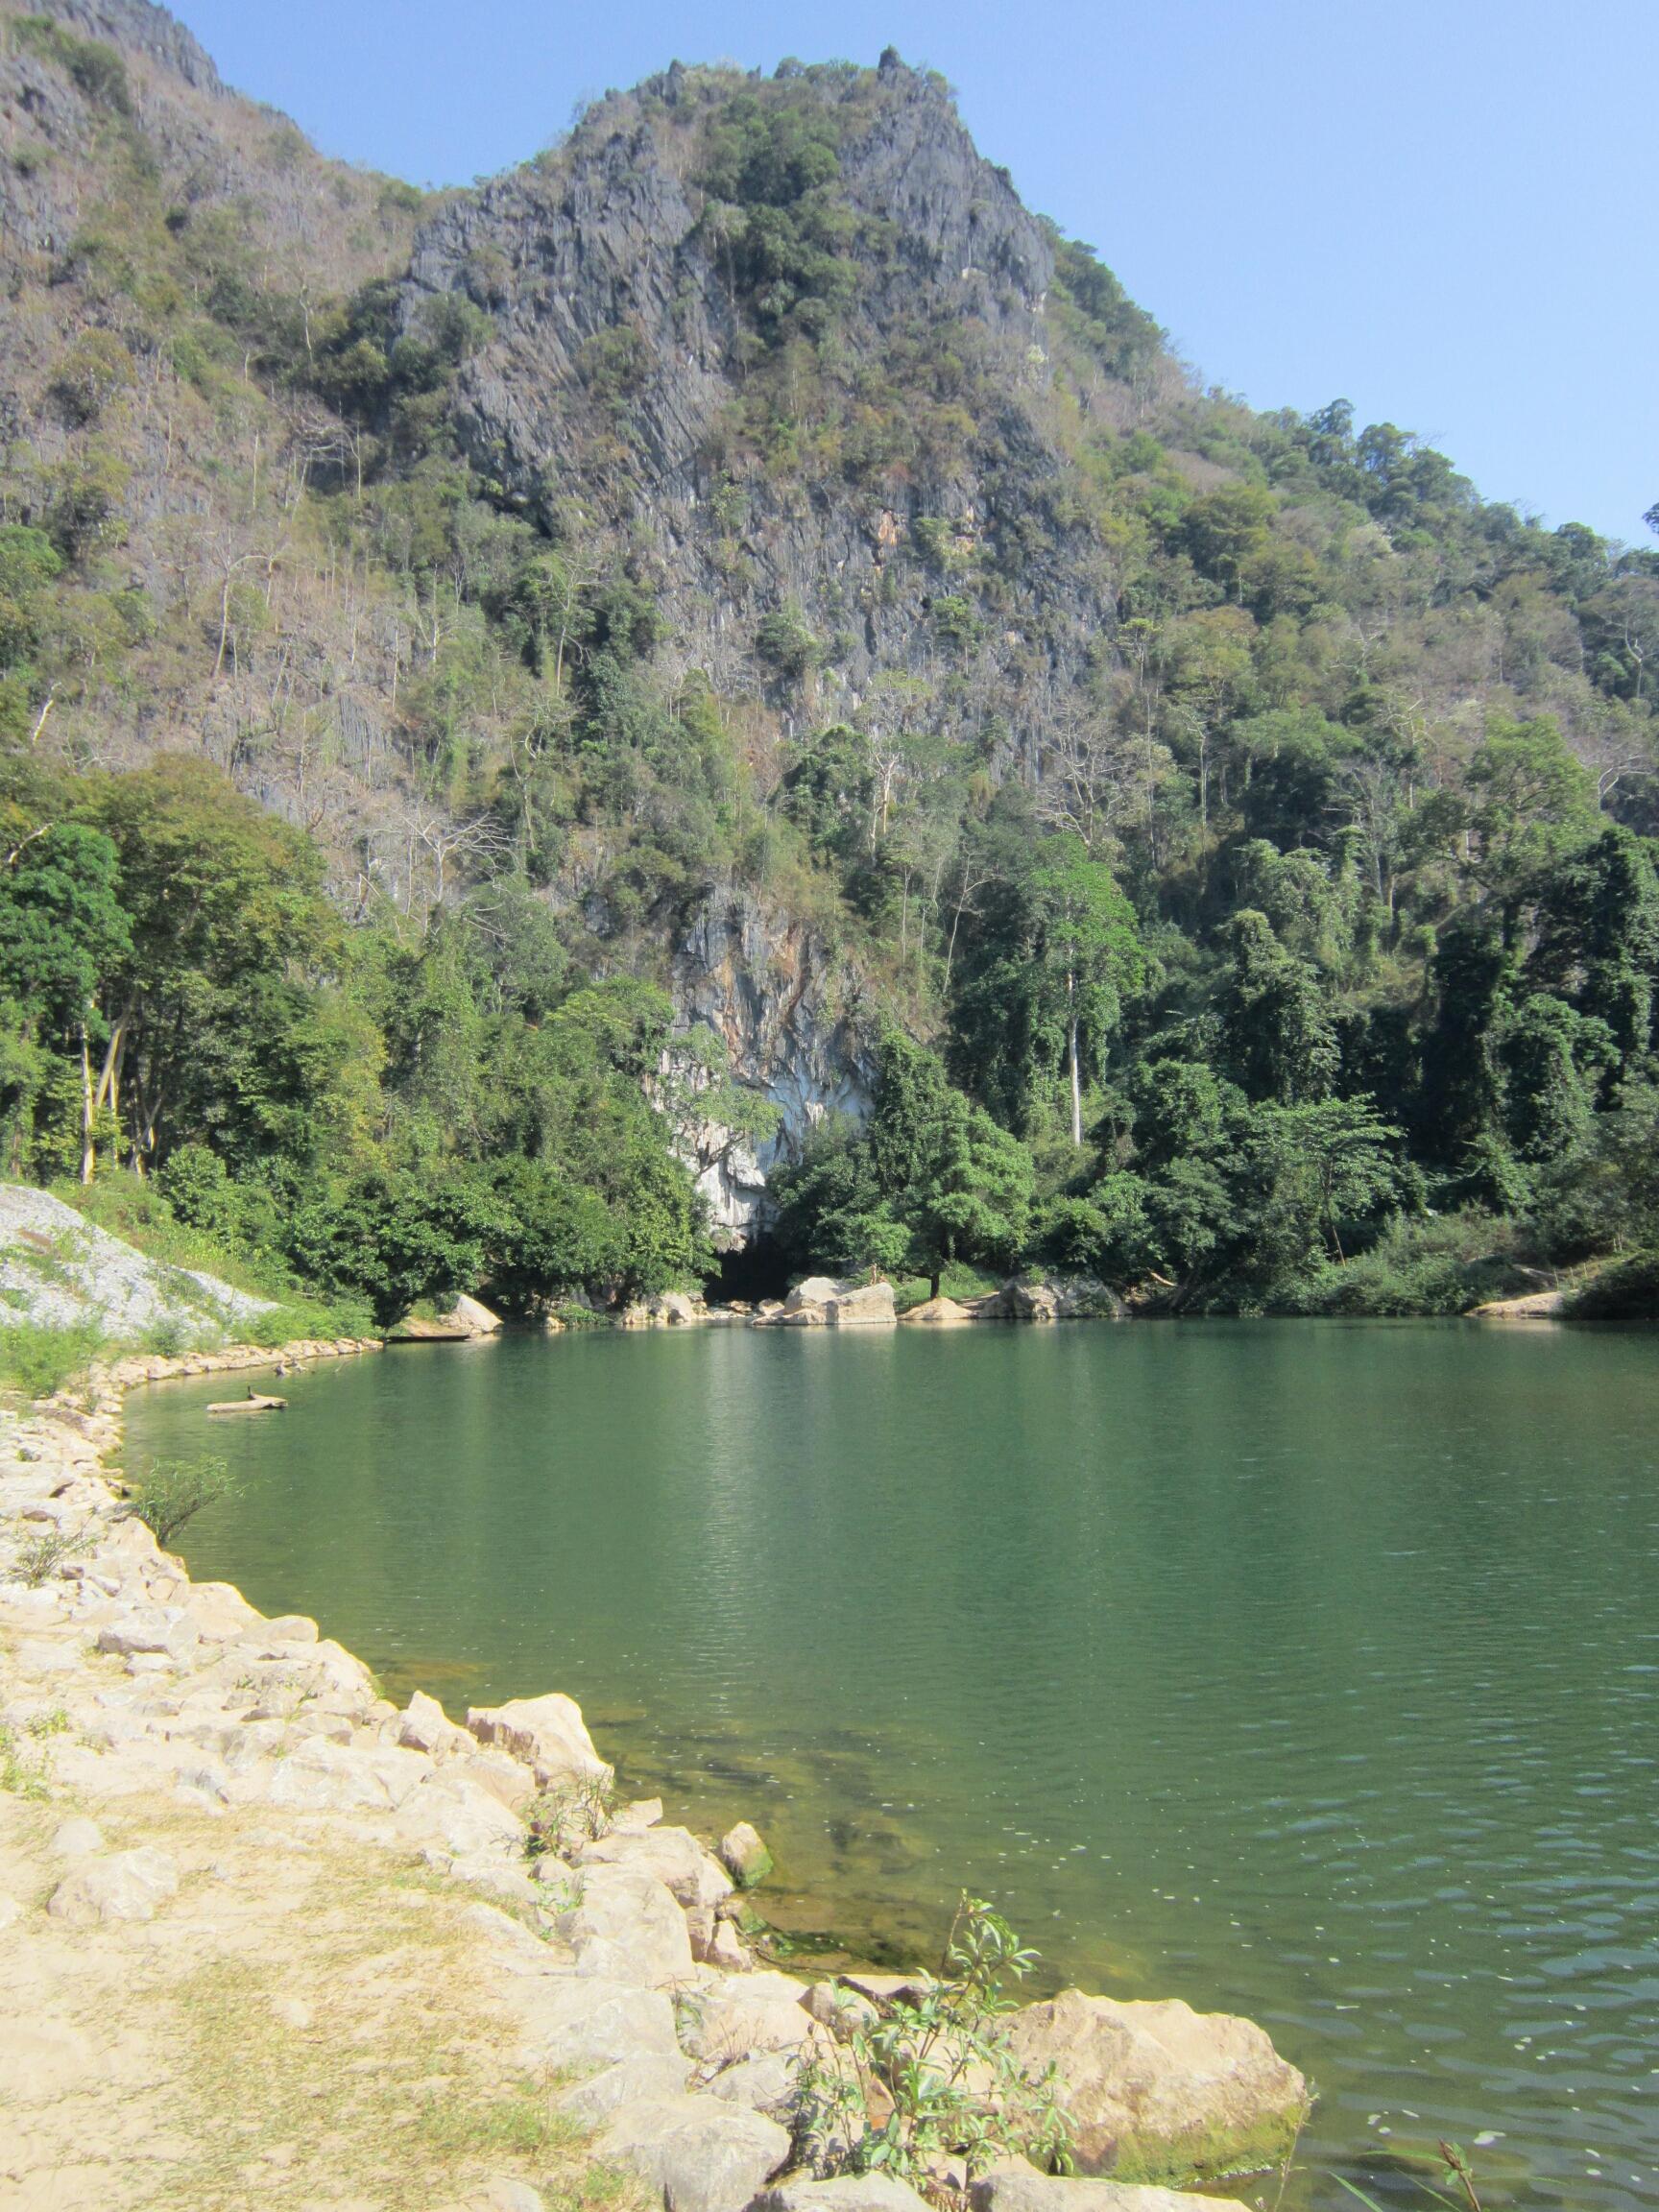 Cave entrance and pool at Konglor, Laos